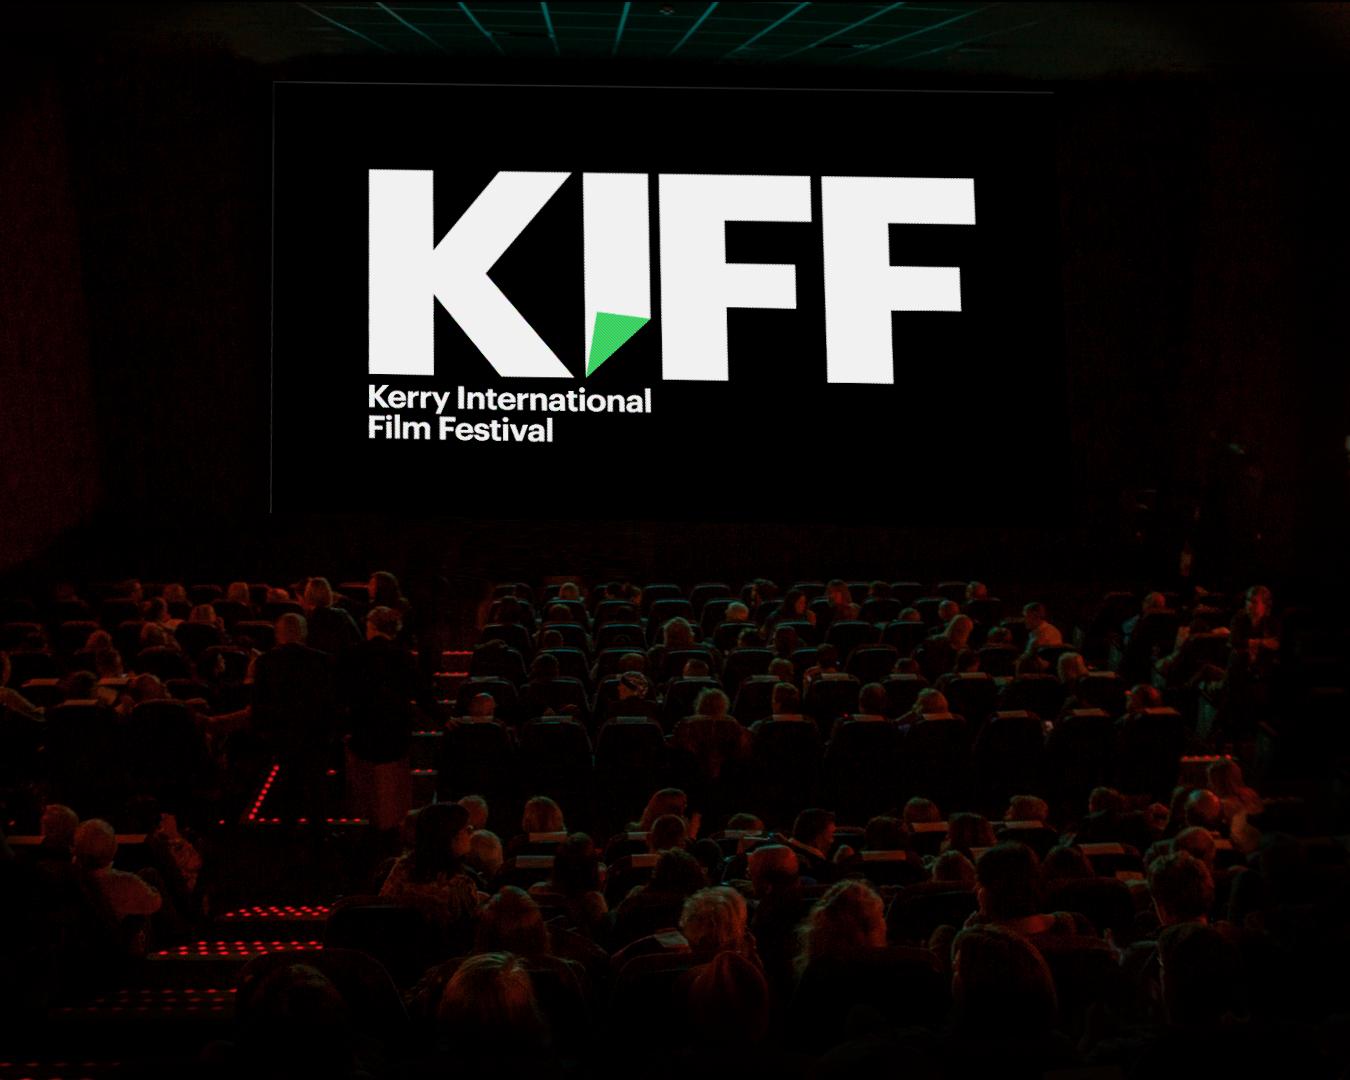 Kerry International Film Festival Auditorium